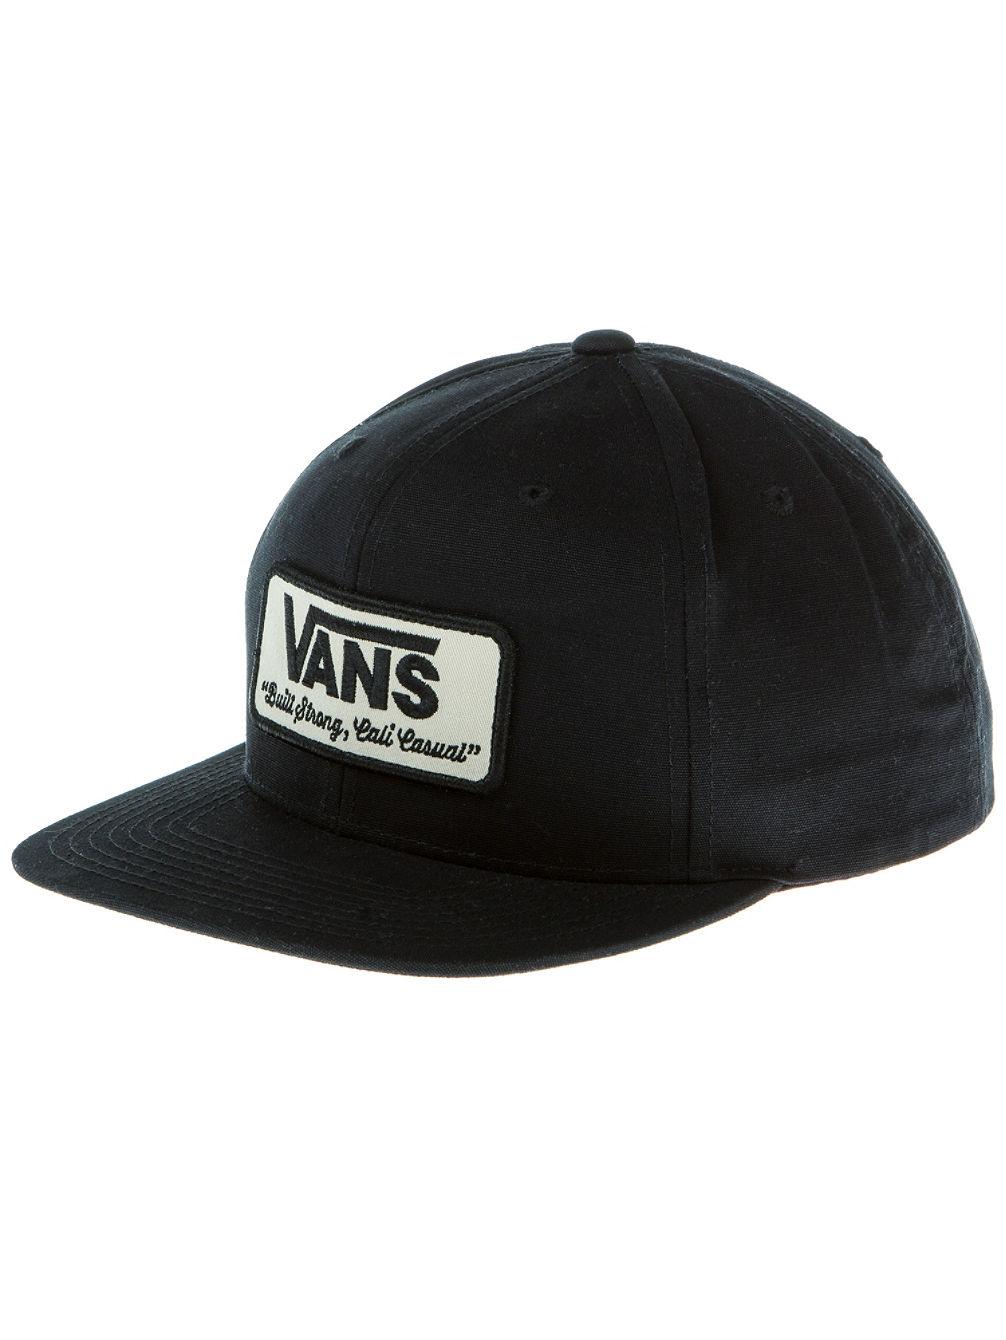 Buy Vans Rowley Snapback Cap online at blue-tomato.com 3f29603ce625